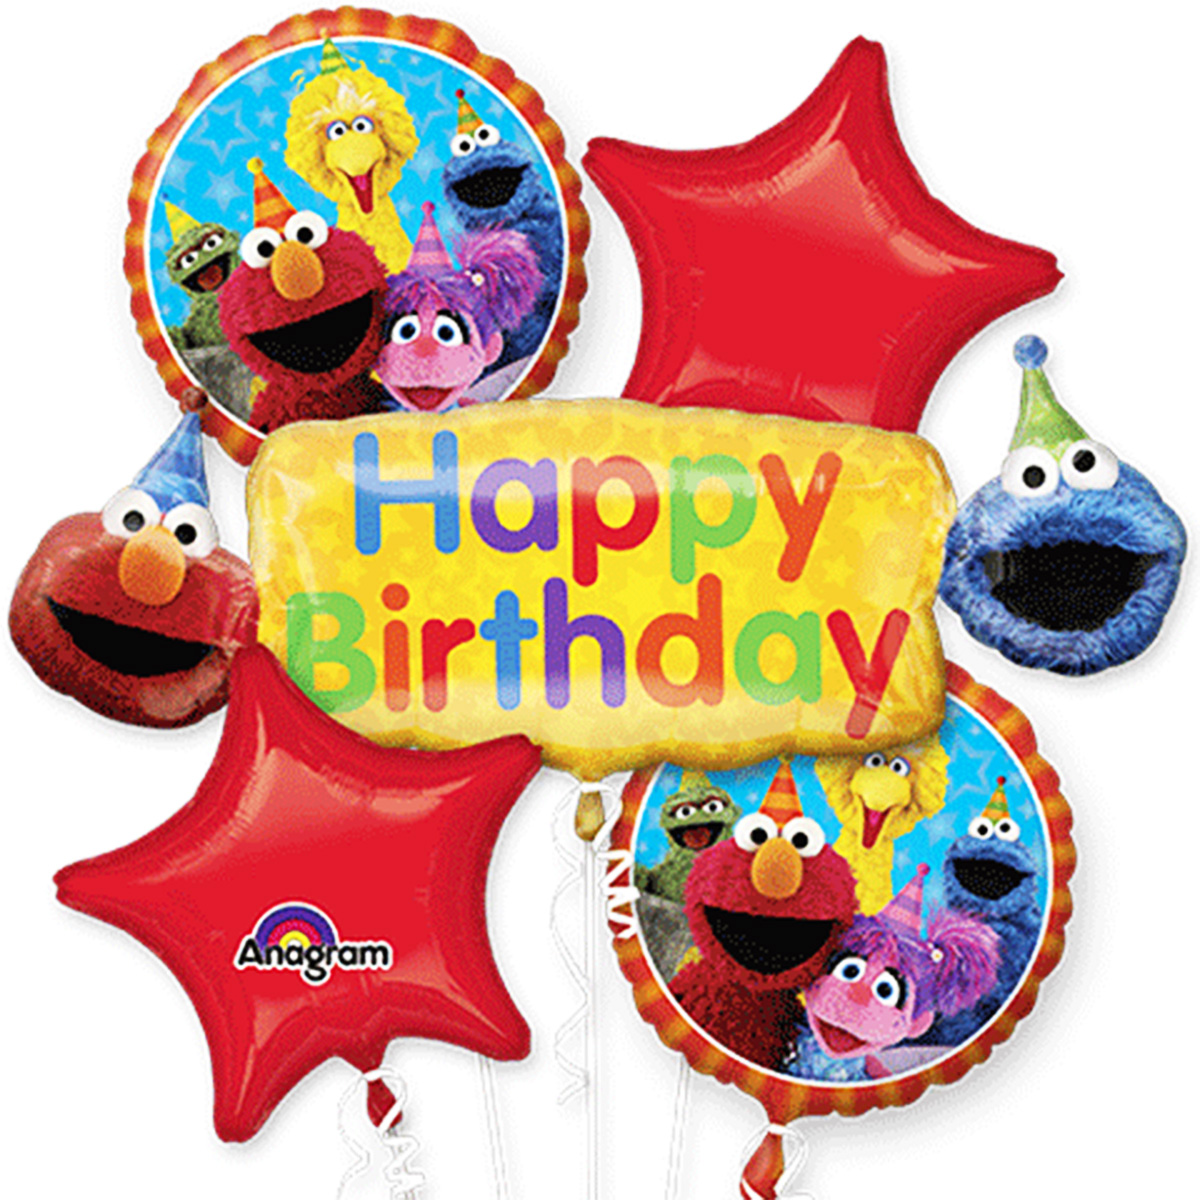 Elmo Sesame Street Happy Birthday Authentic Licensed Theme Foil Balloon Bouquet